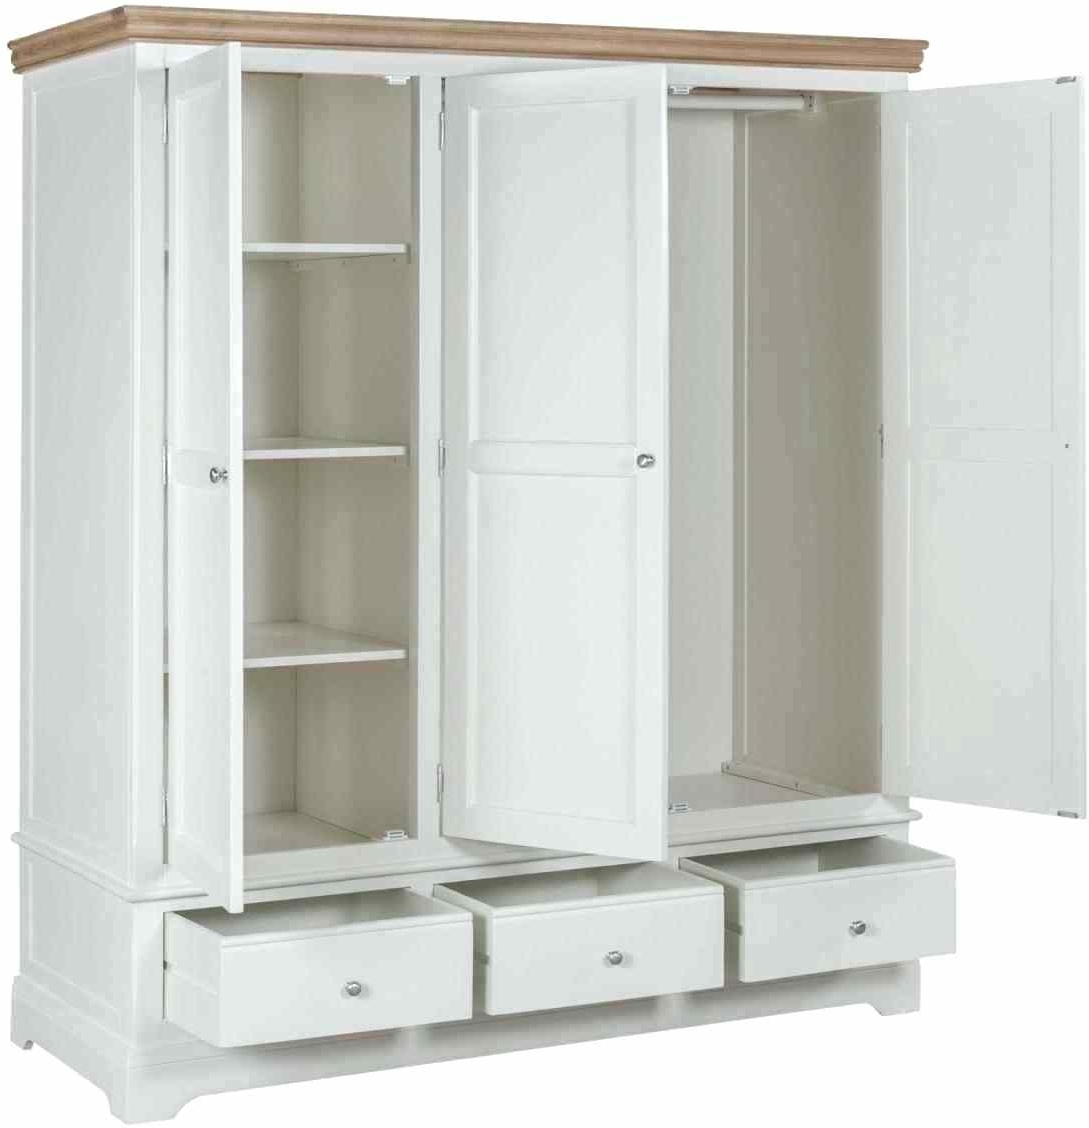 Most Current Closet: Louvered Sliding Closet Doors (View 5 of 15)